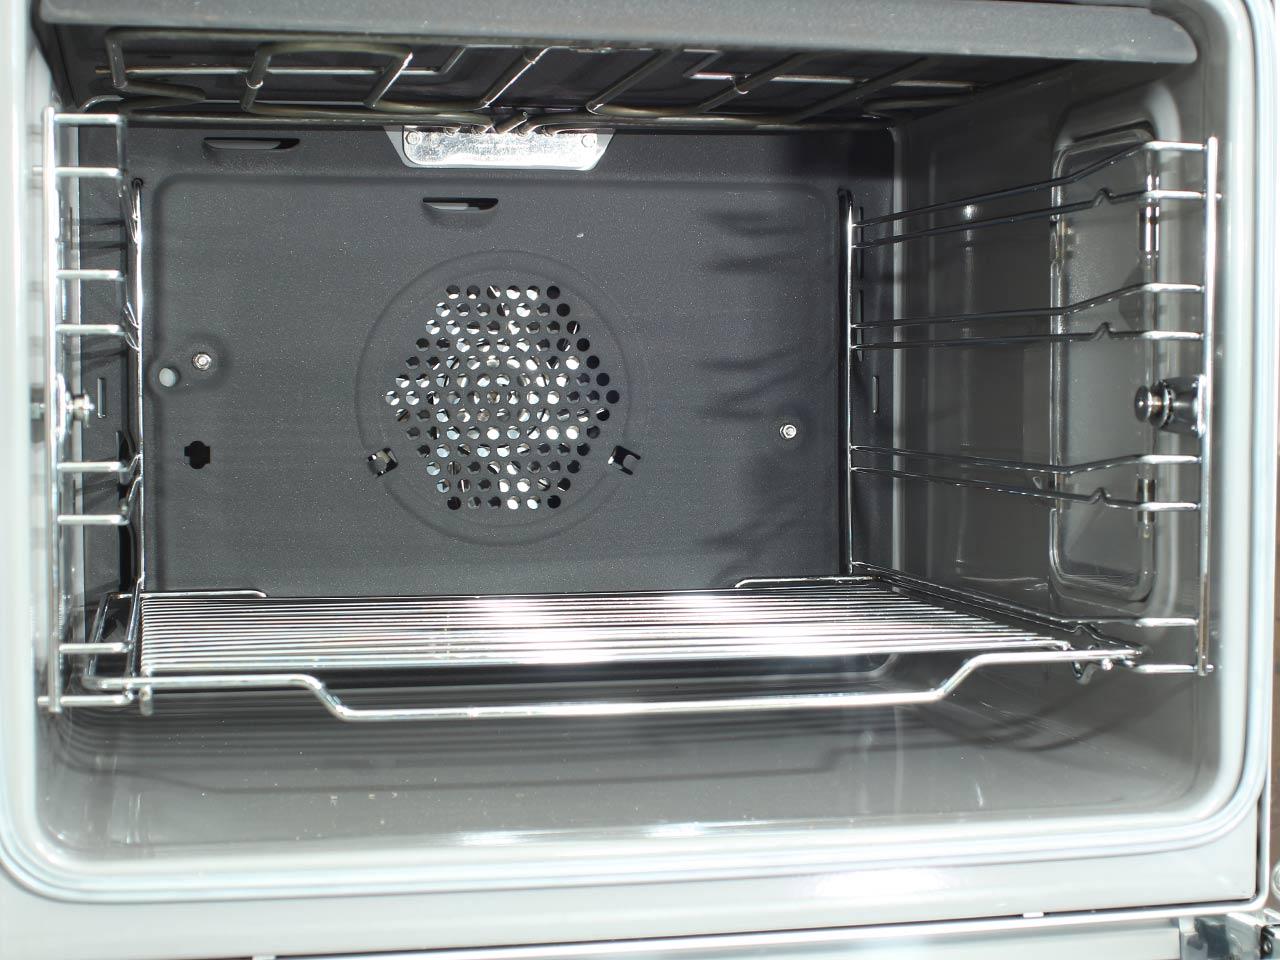 miele h4620b kat einbau backofen edelstahl katalytische. Black Bedroom Furniture Sets. Home Design Ideas